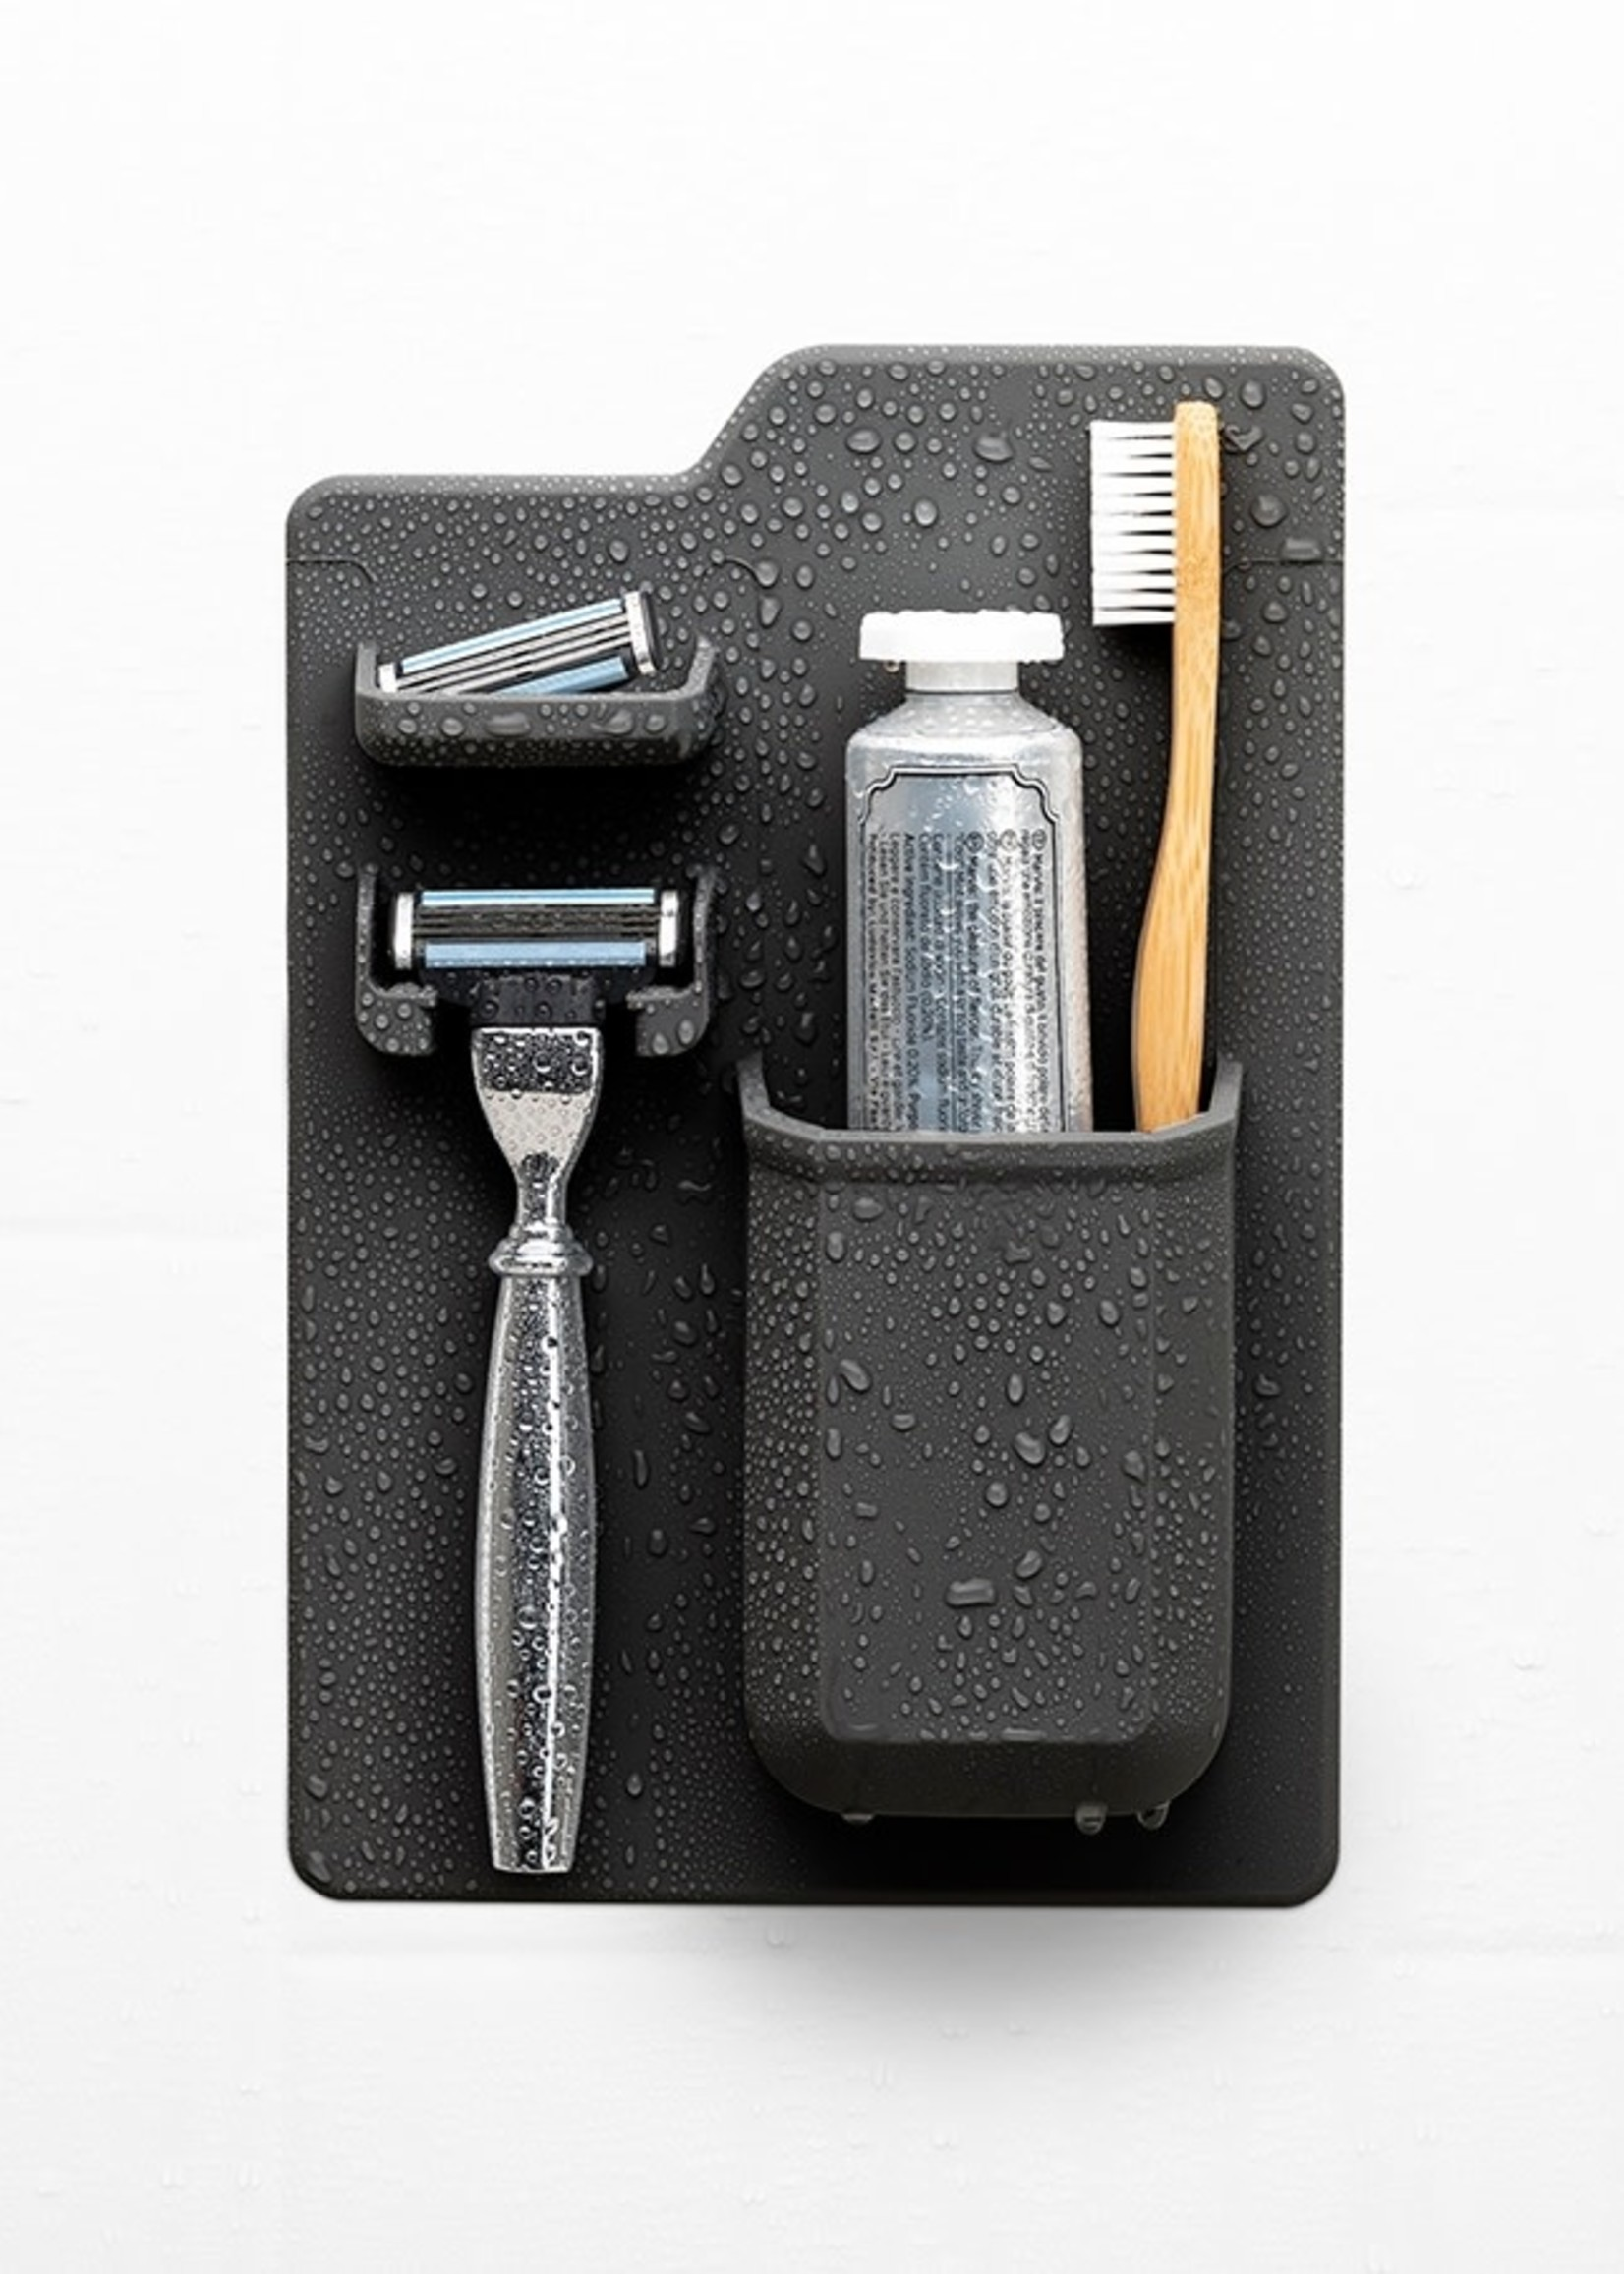 Tooletries The Harvey Toothbrush & Razor Holder Charcoal